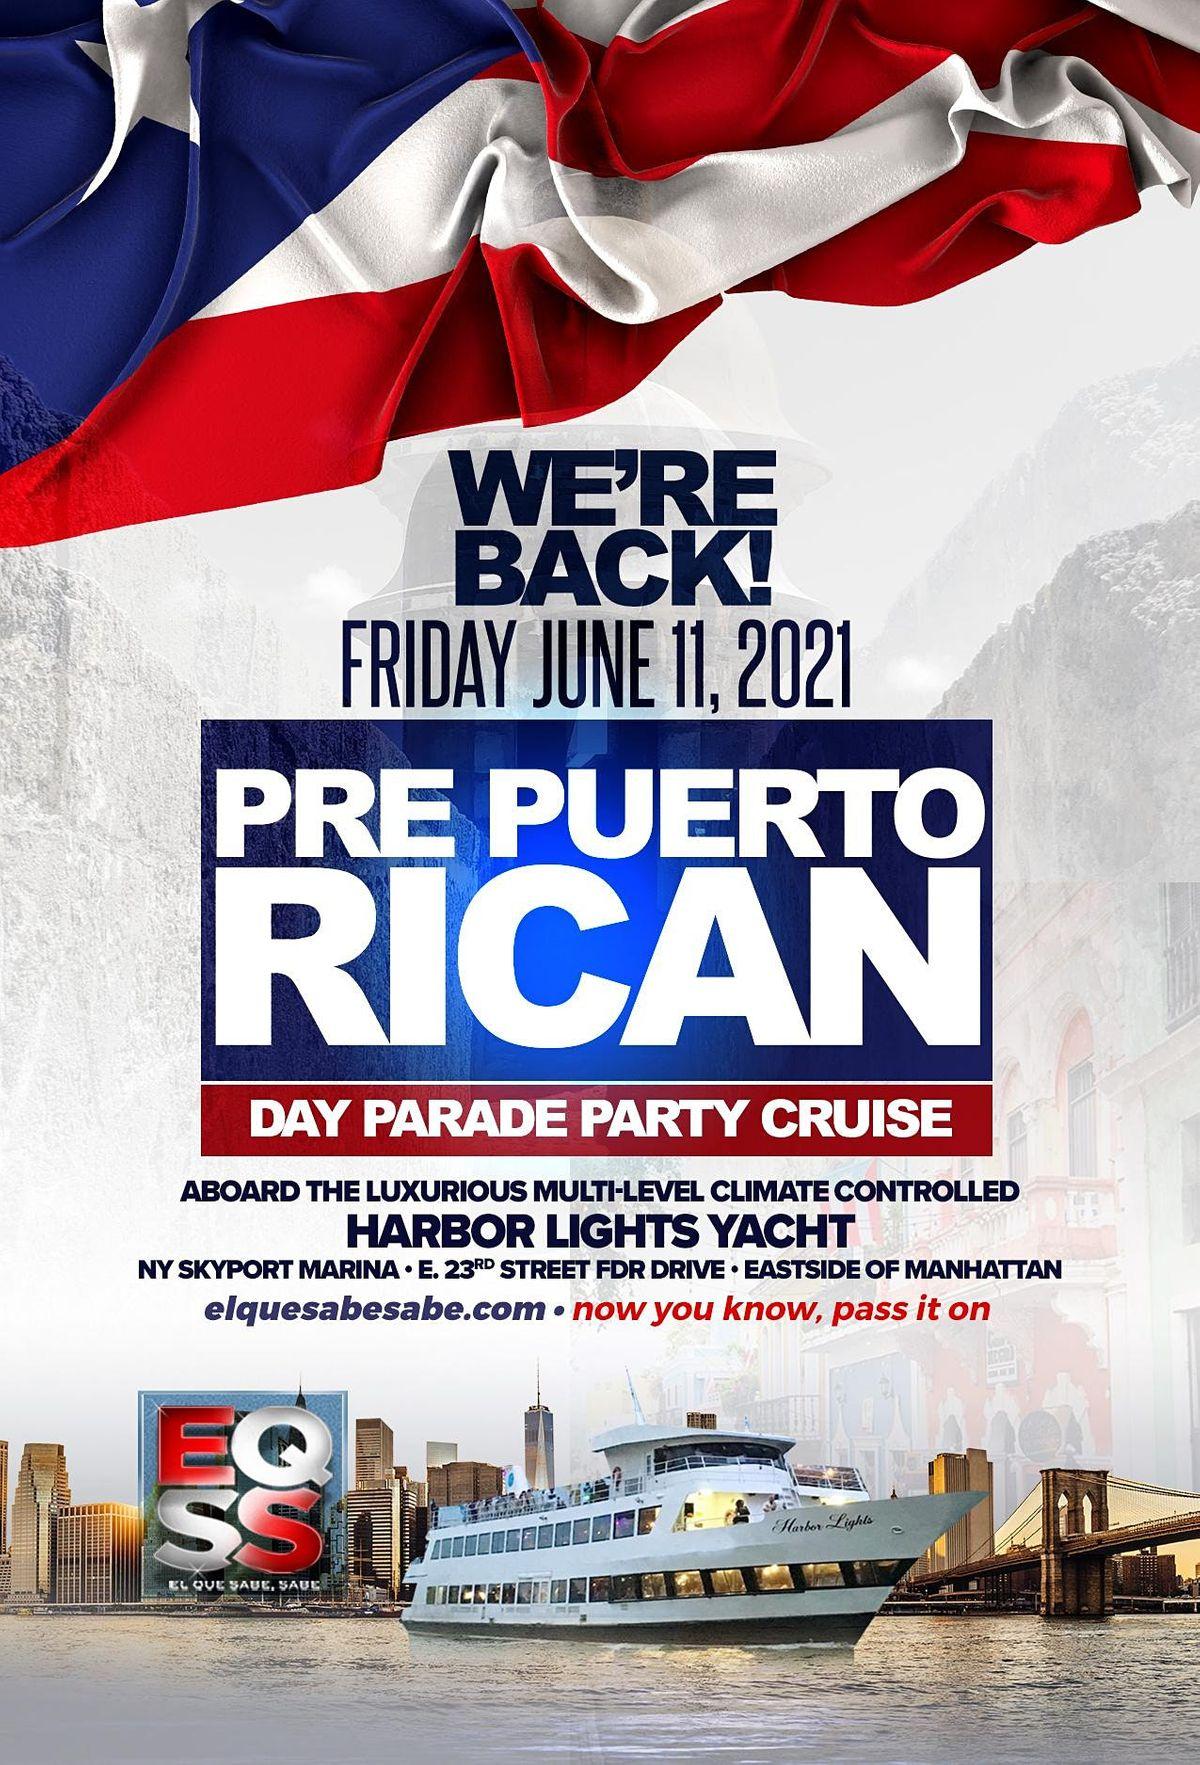 Pre Puerto Rican Day Parade Party Cruise w\/ Jerry Geraldo